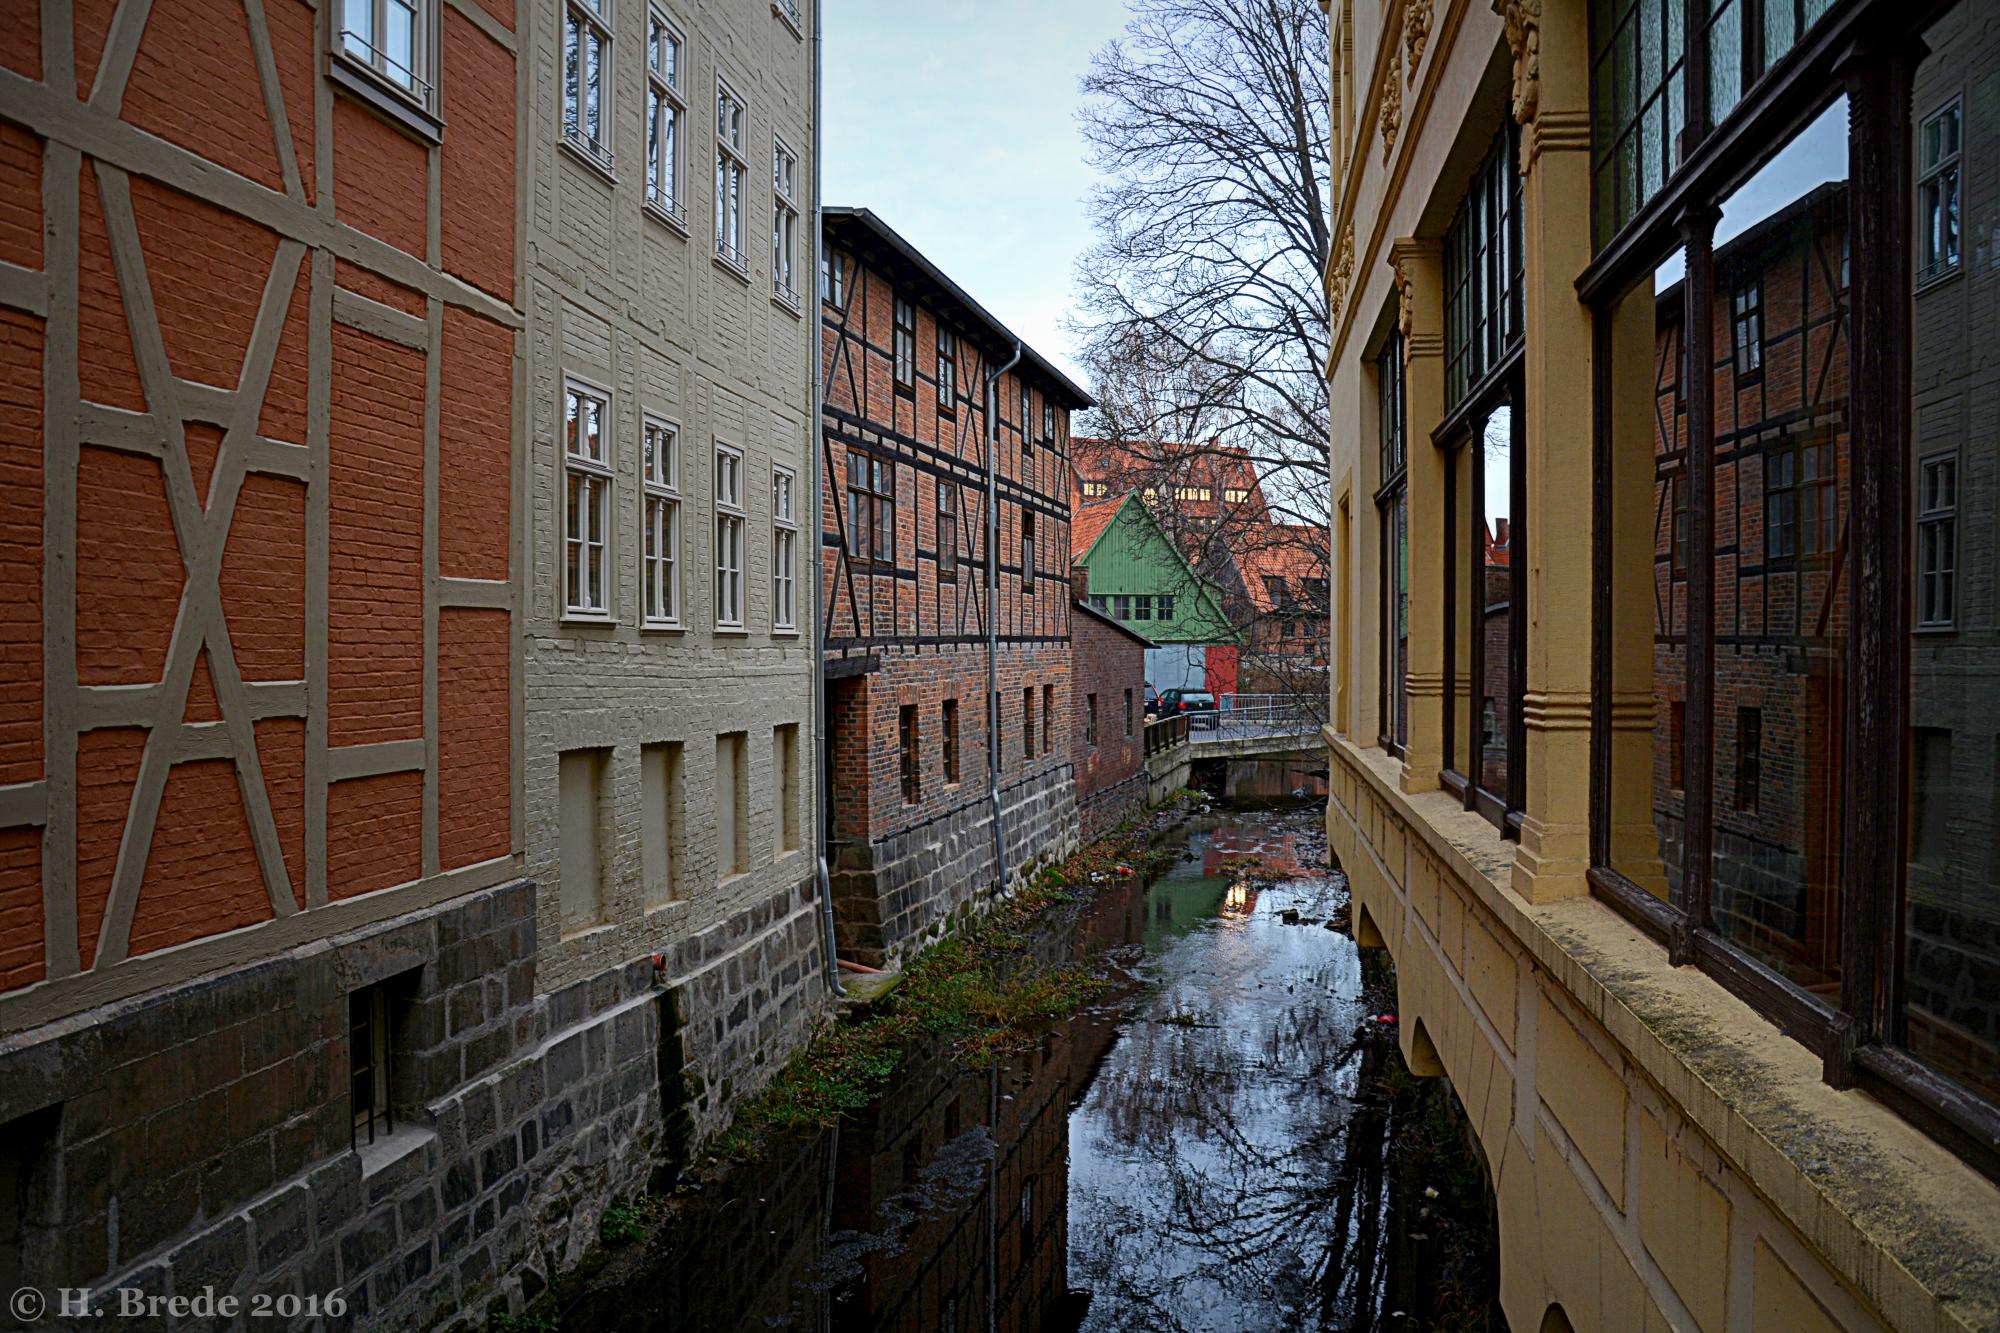 Dutch Ditch in Quedlingburg, Germany